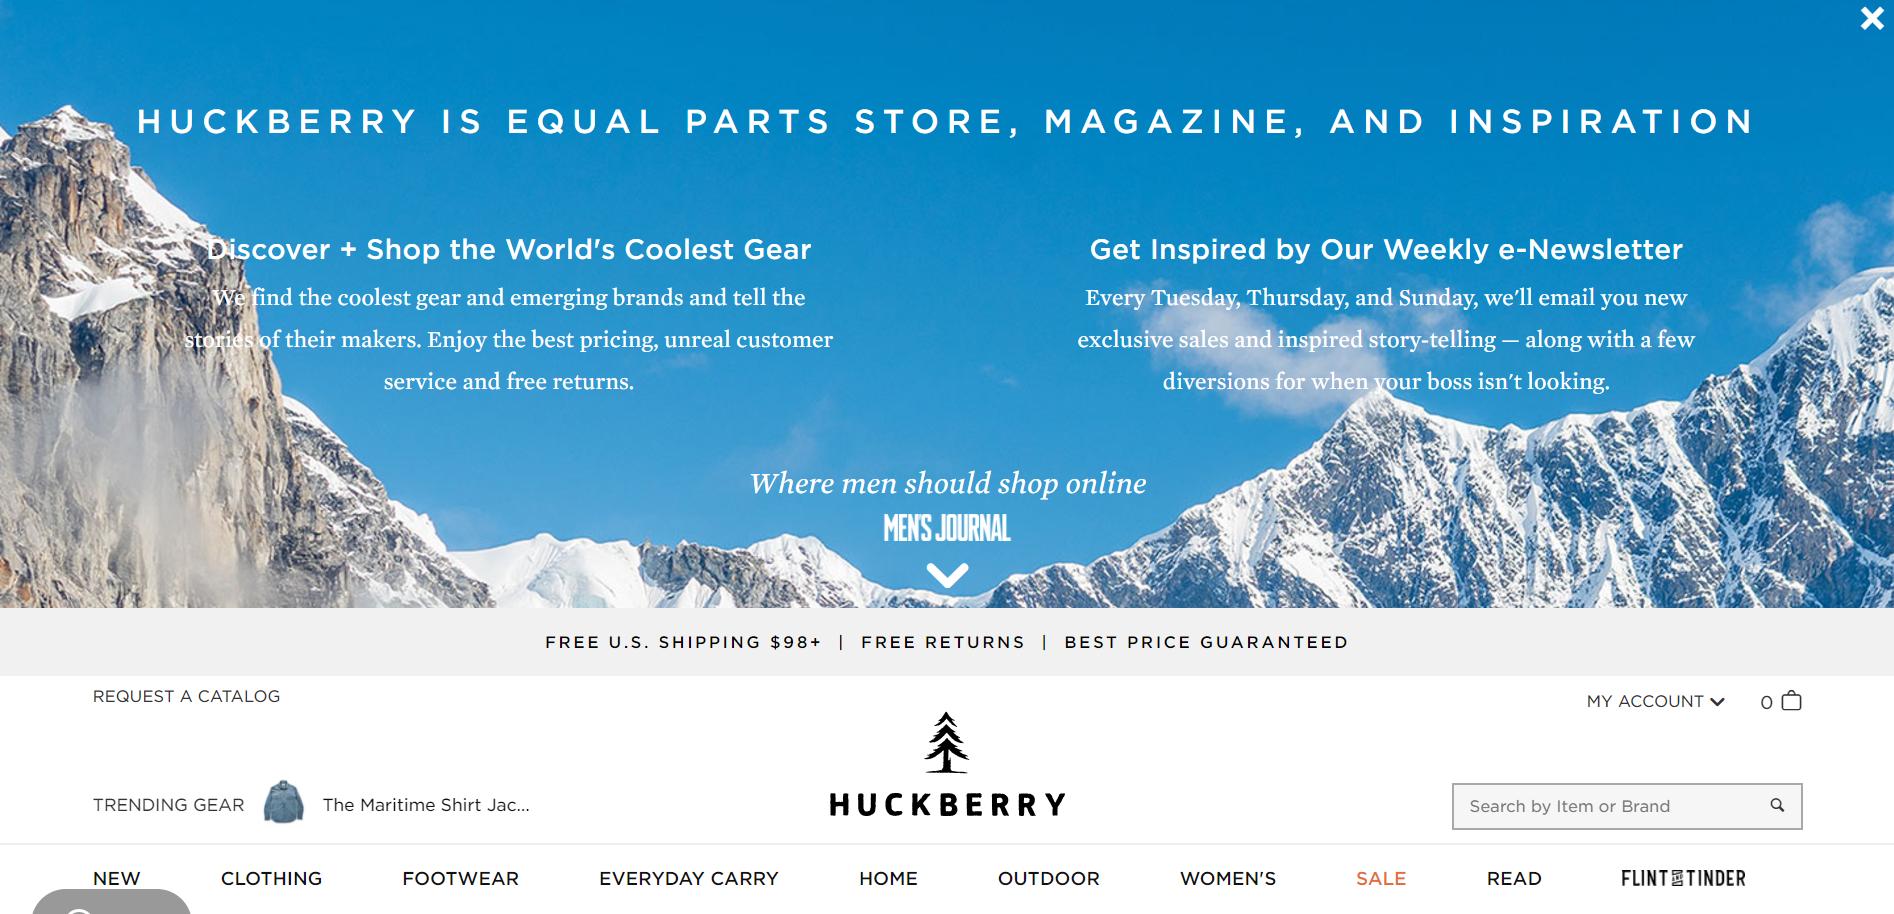 Huckberry Review